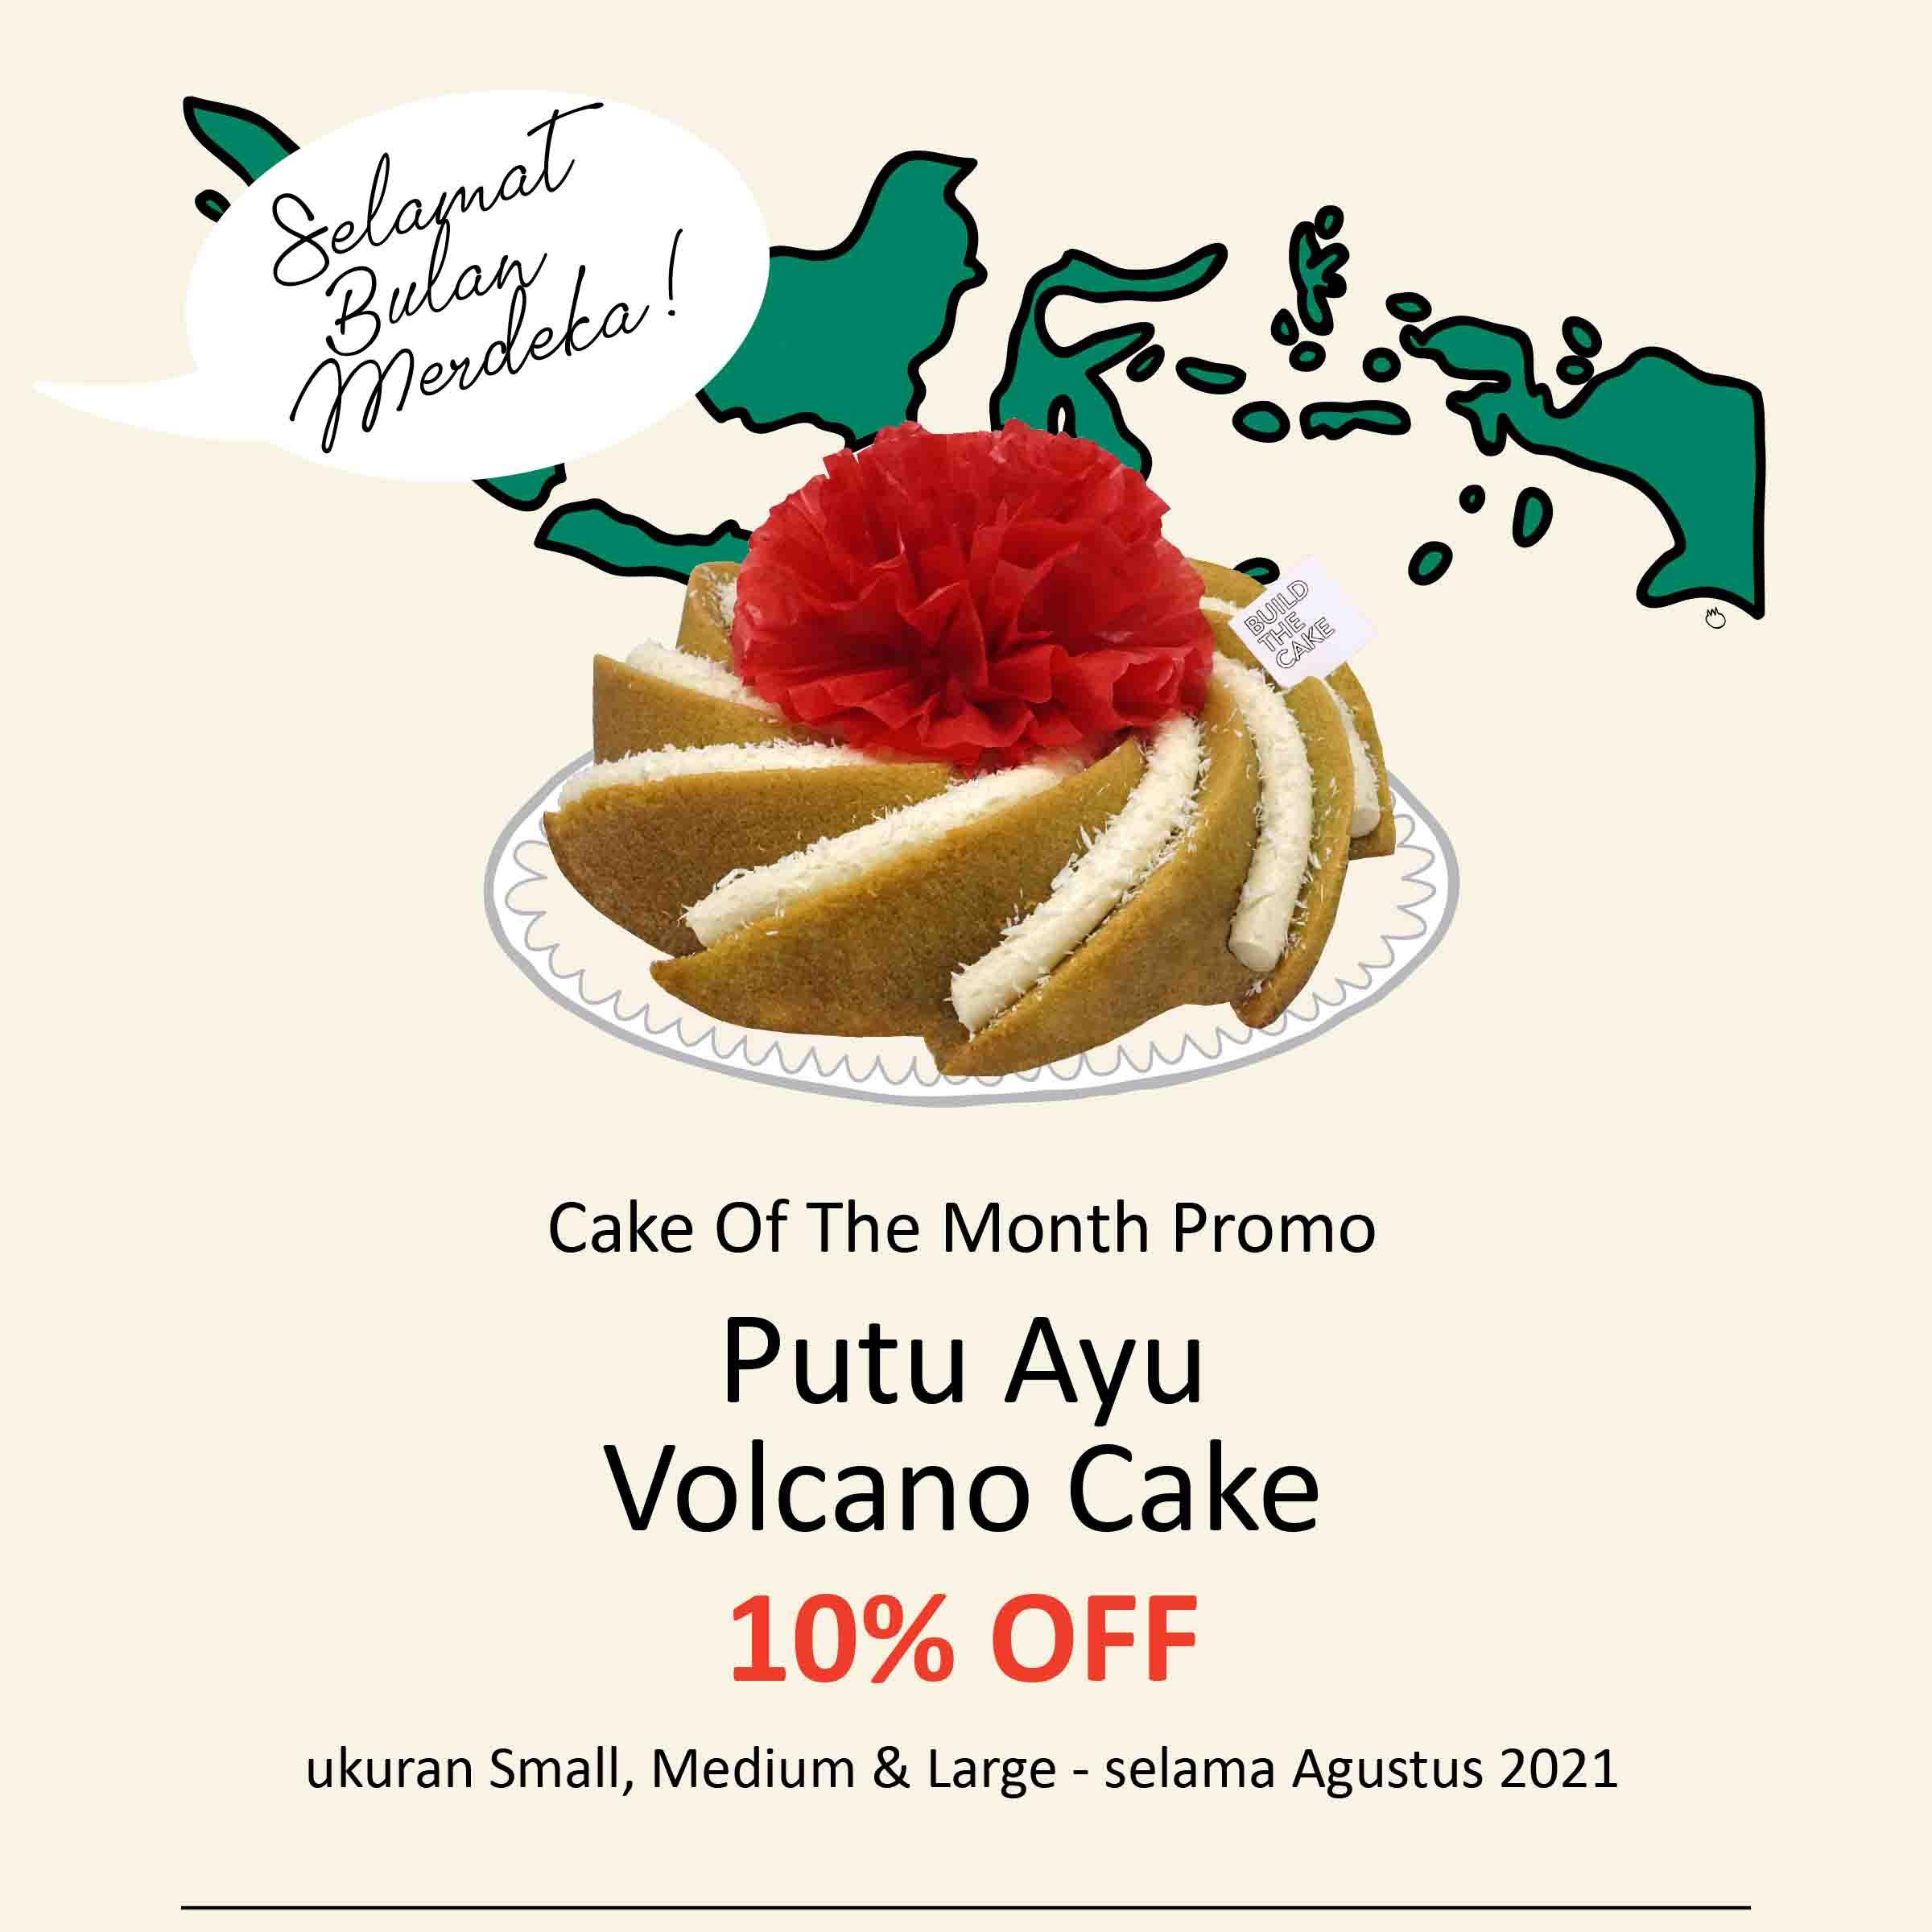 Putu Ayu Volcano Cake